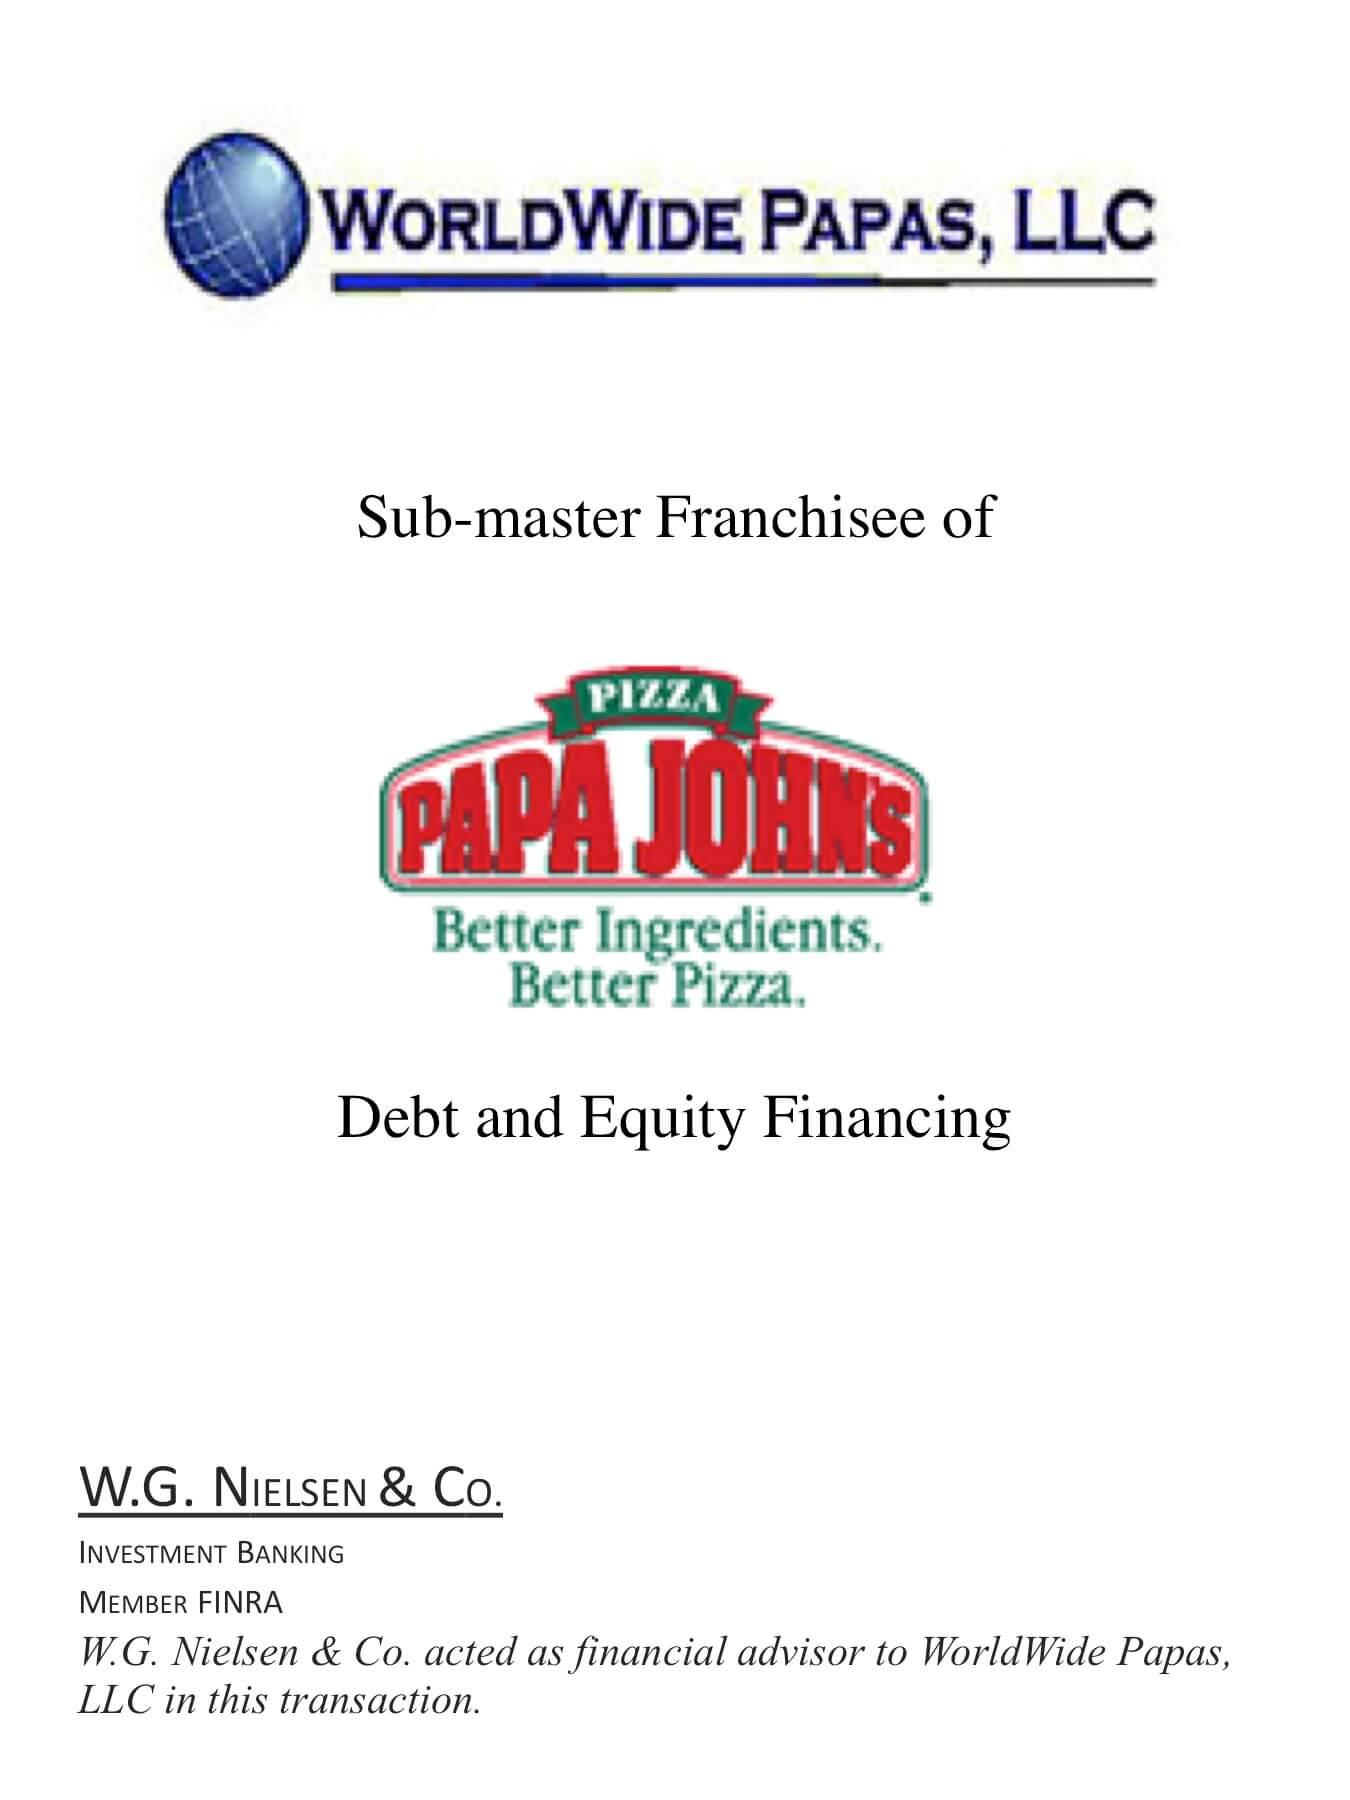 worldwide papas investment banking transaction